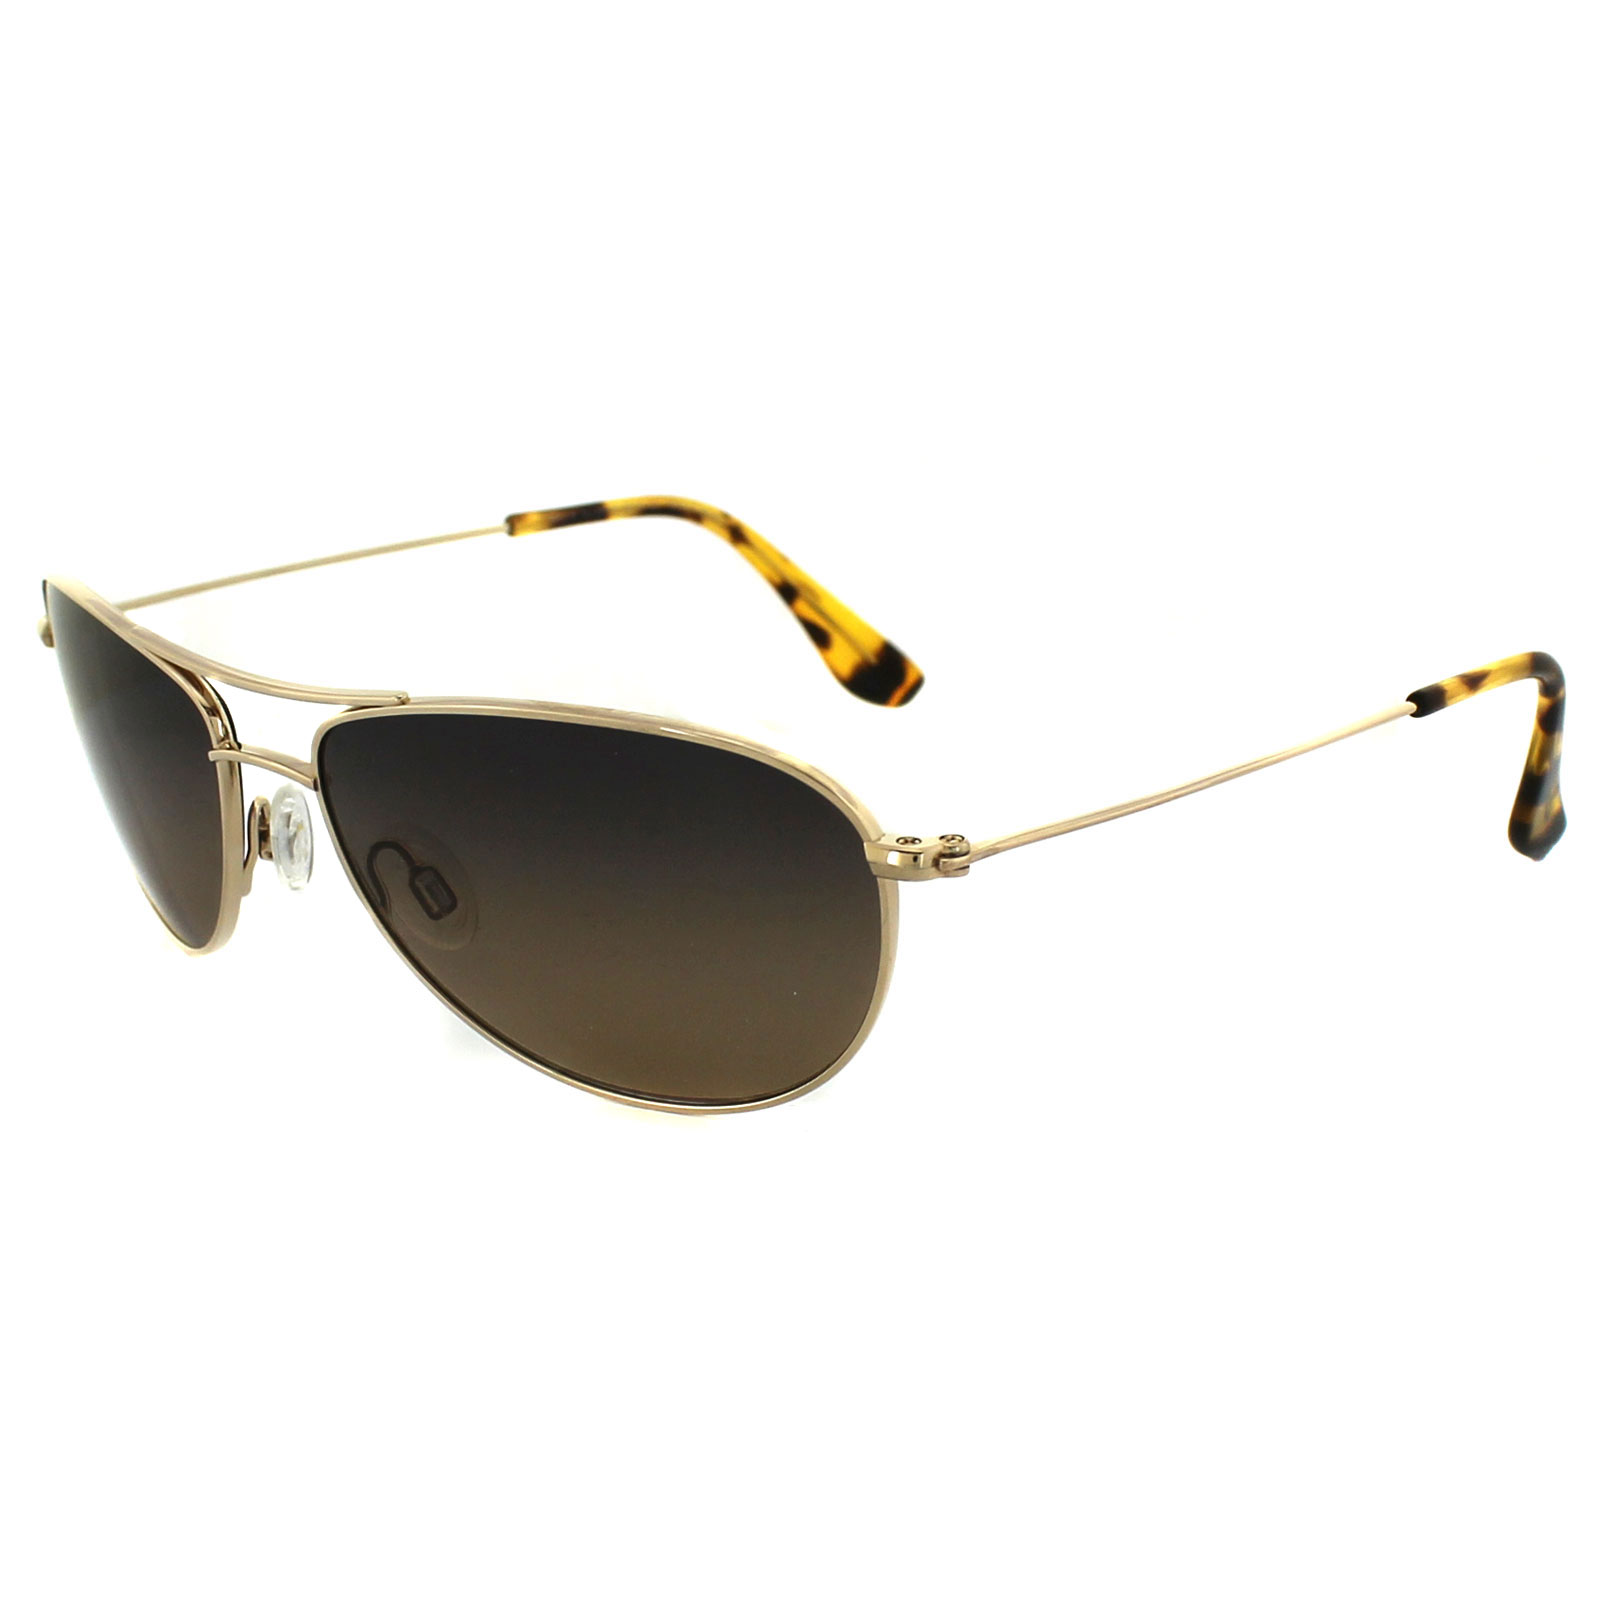 Maui Jim Beach Baby Sunglasses  maui jim sunglasses baby beach hs245 16 gold bronze polarized